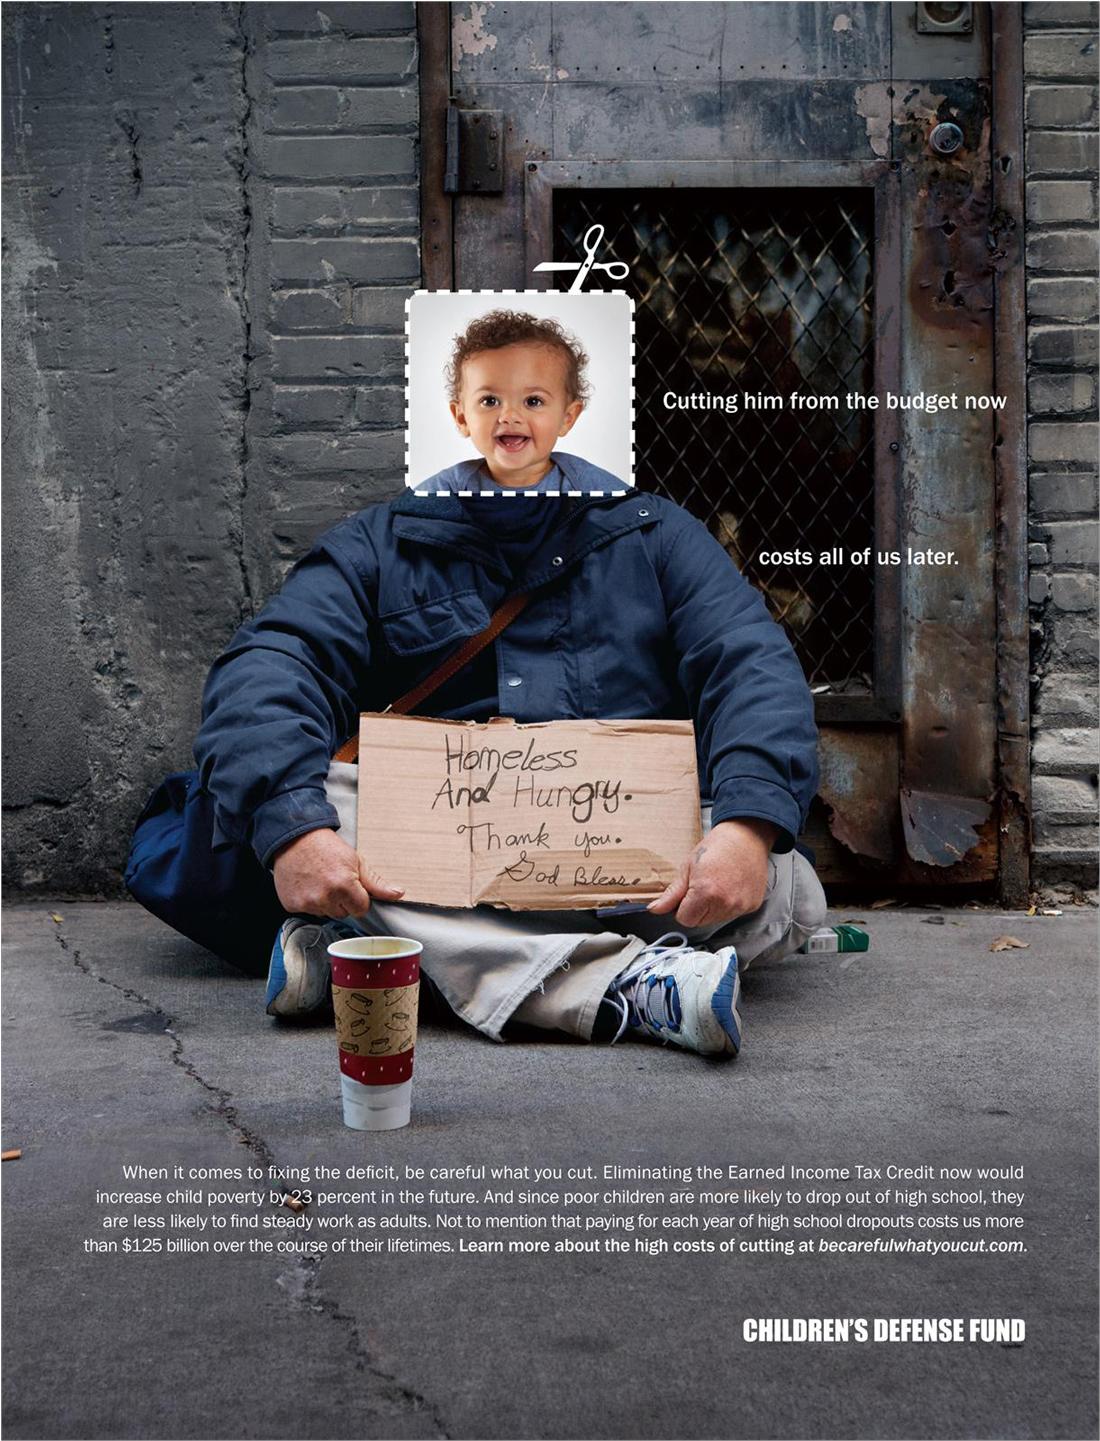 17 Creative Visual Marketing Campaigns by Nonprofits-Children-s-Defense-Fund